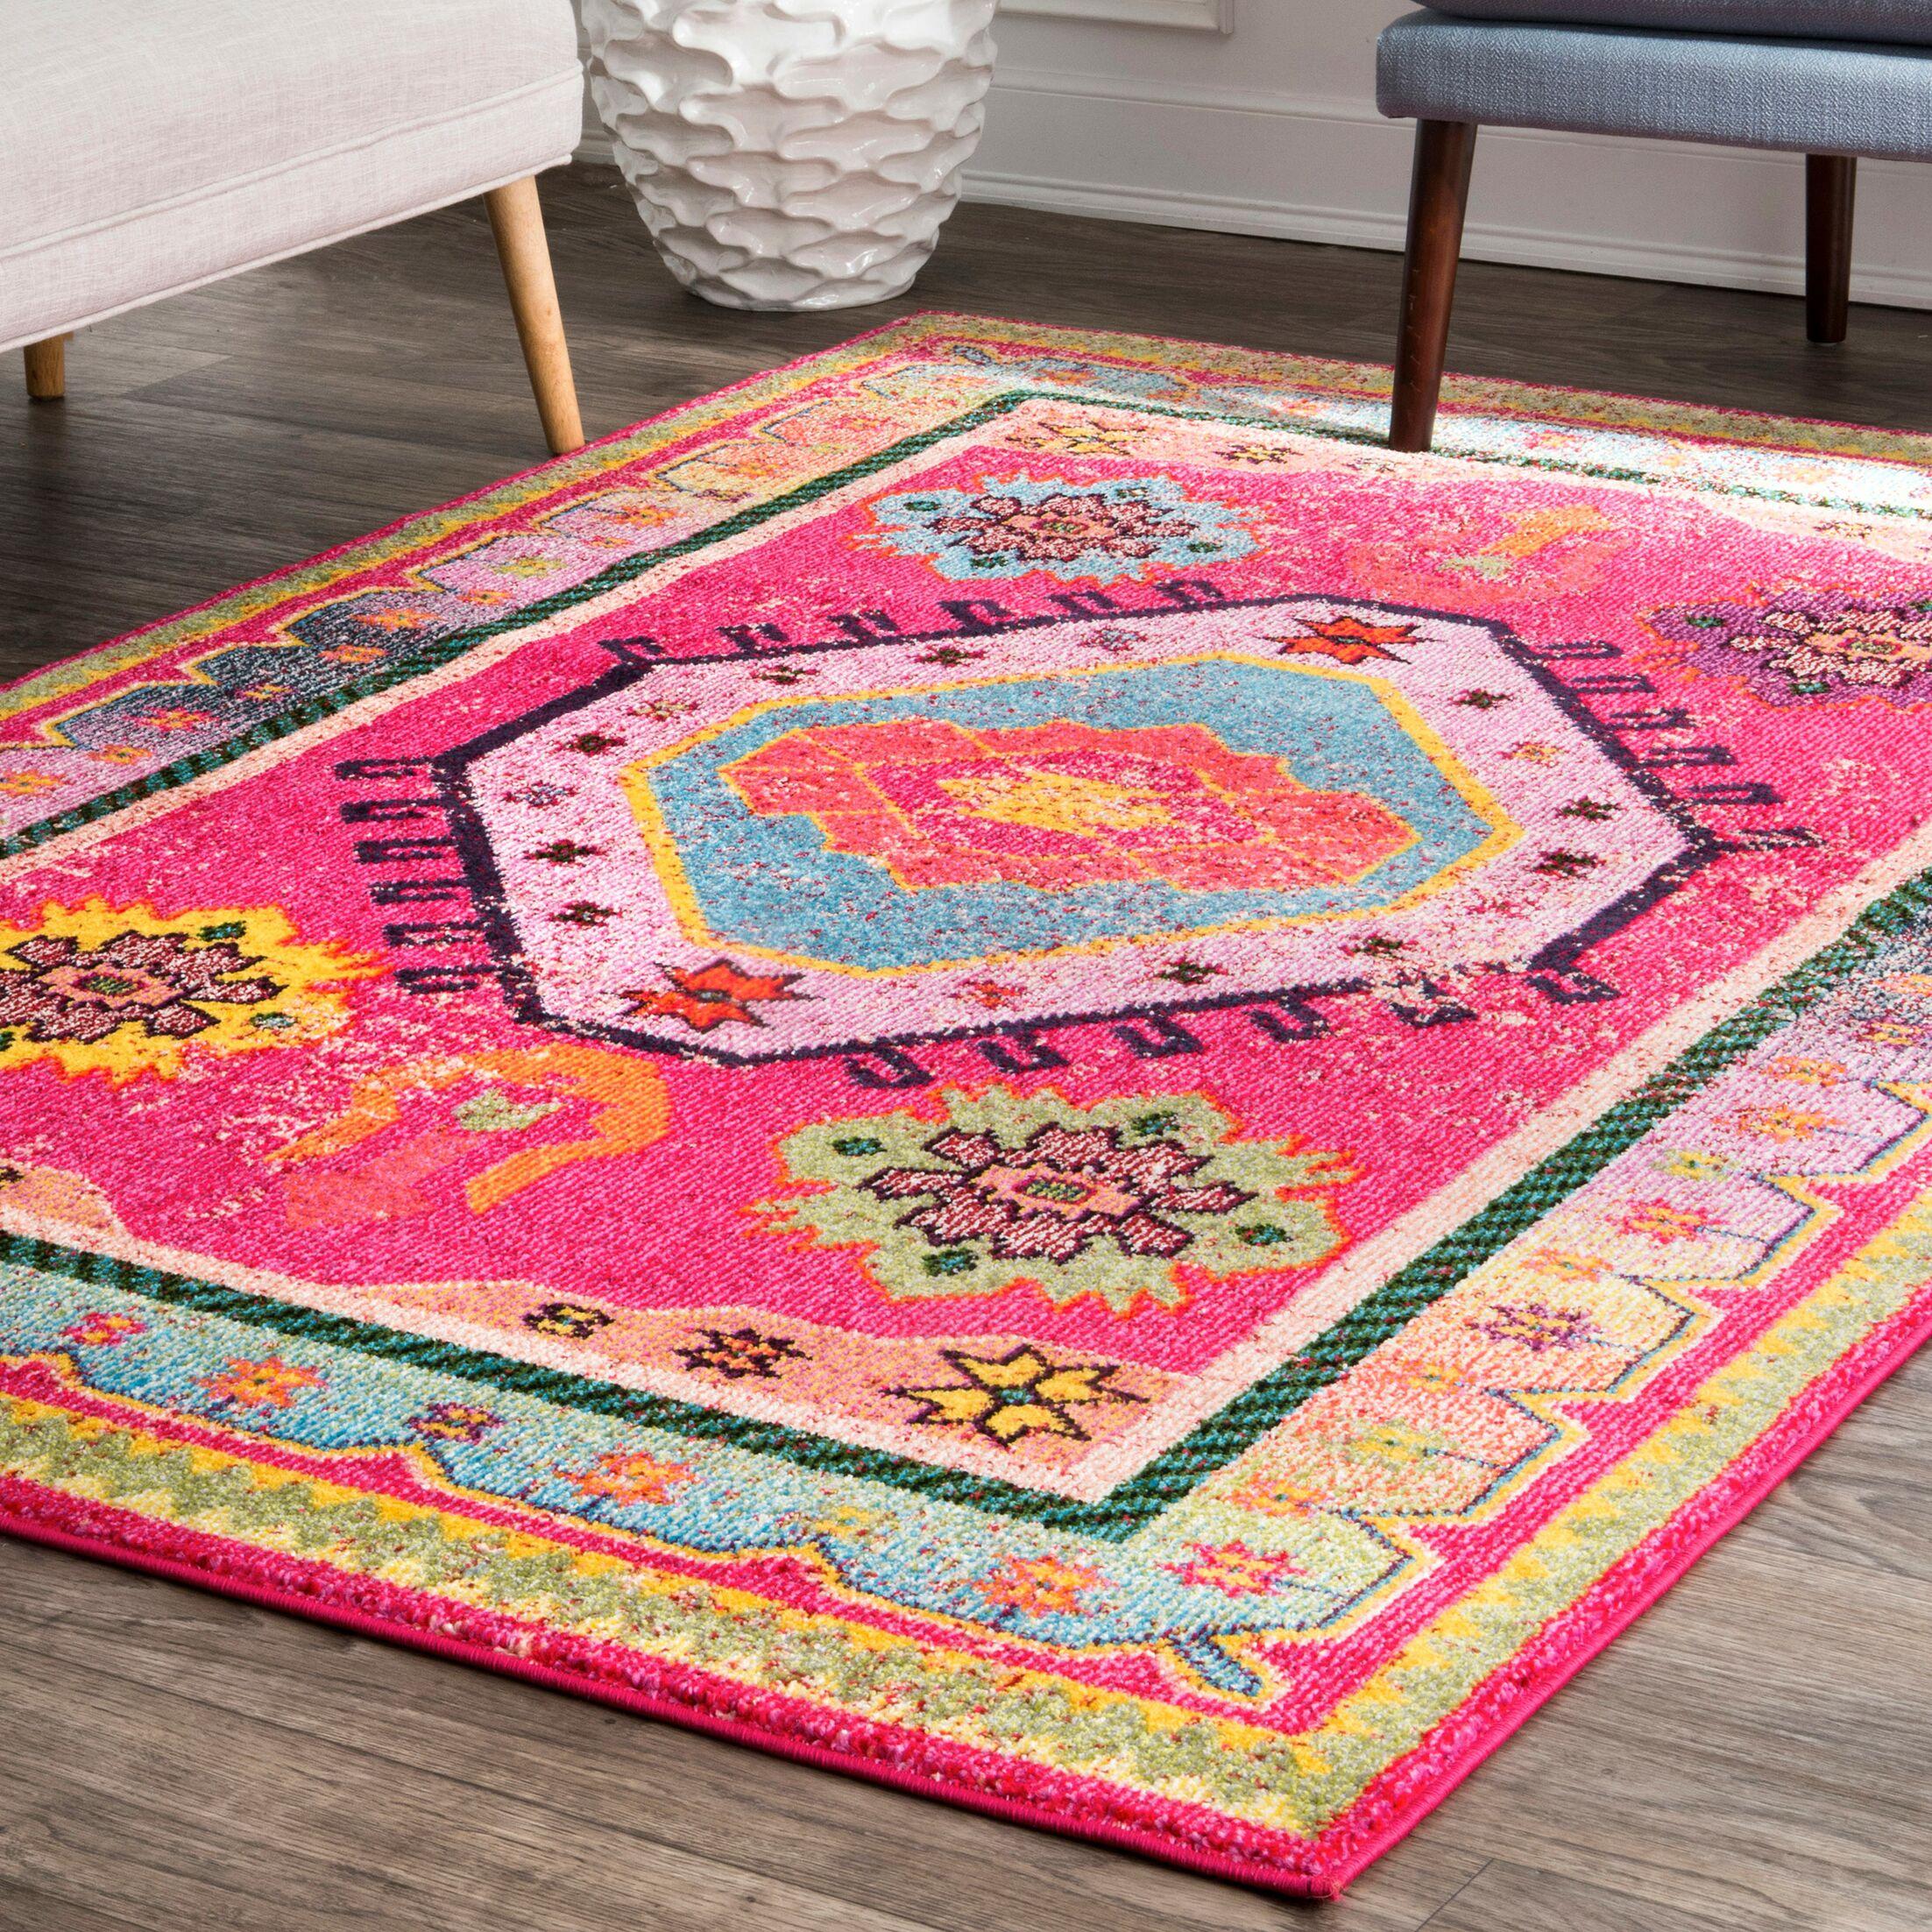 Herlinda Pink Area Rug Rug Size: Rectangle 5' x 8'